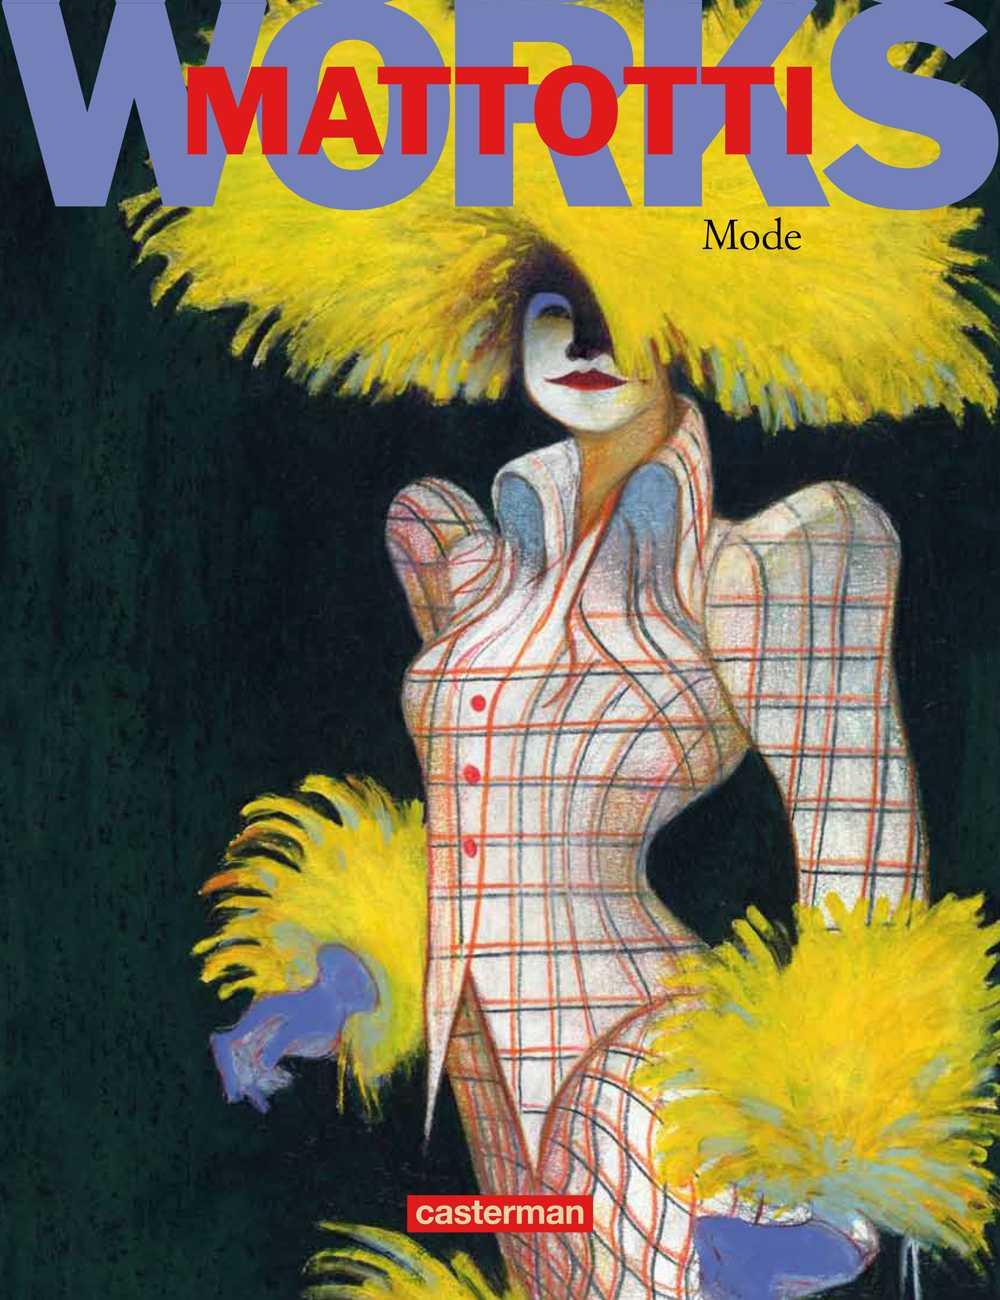 Works, femmes de mode selon Lorenzo Mattotti